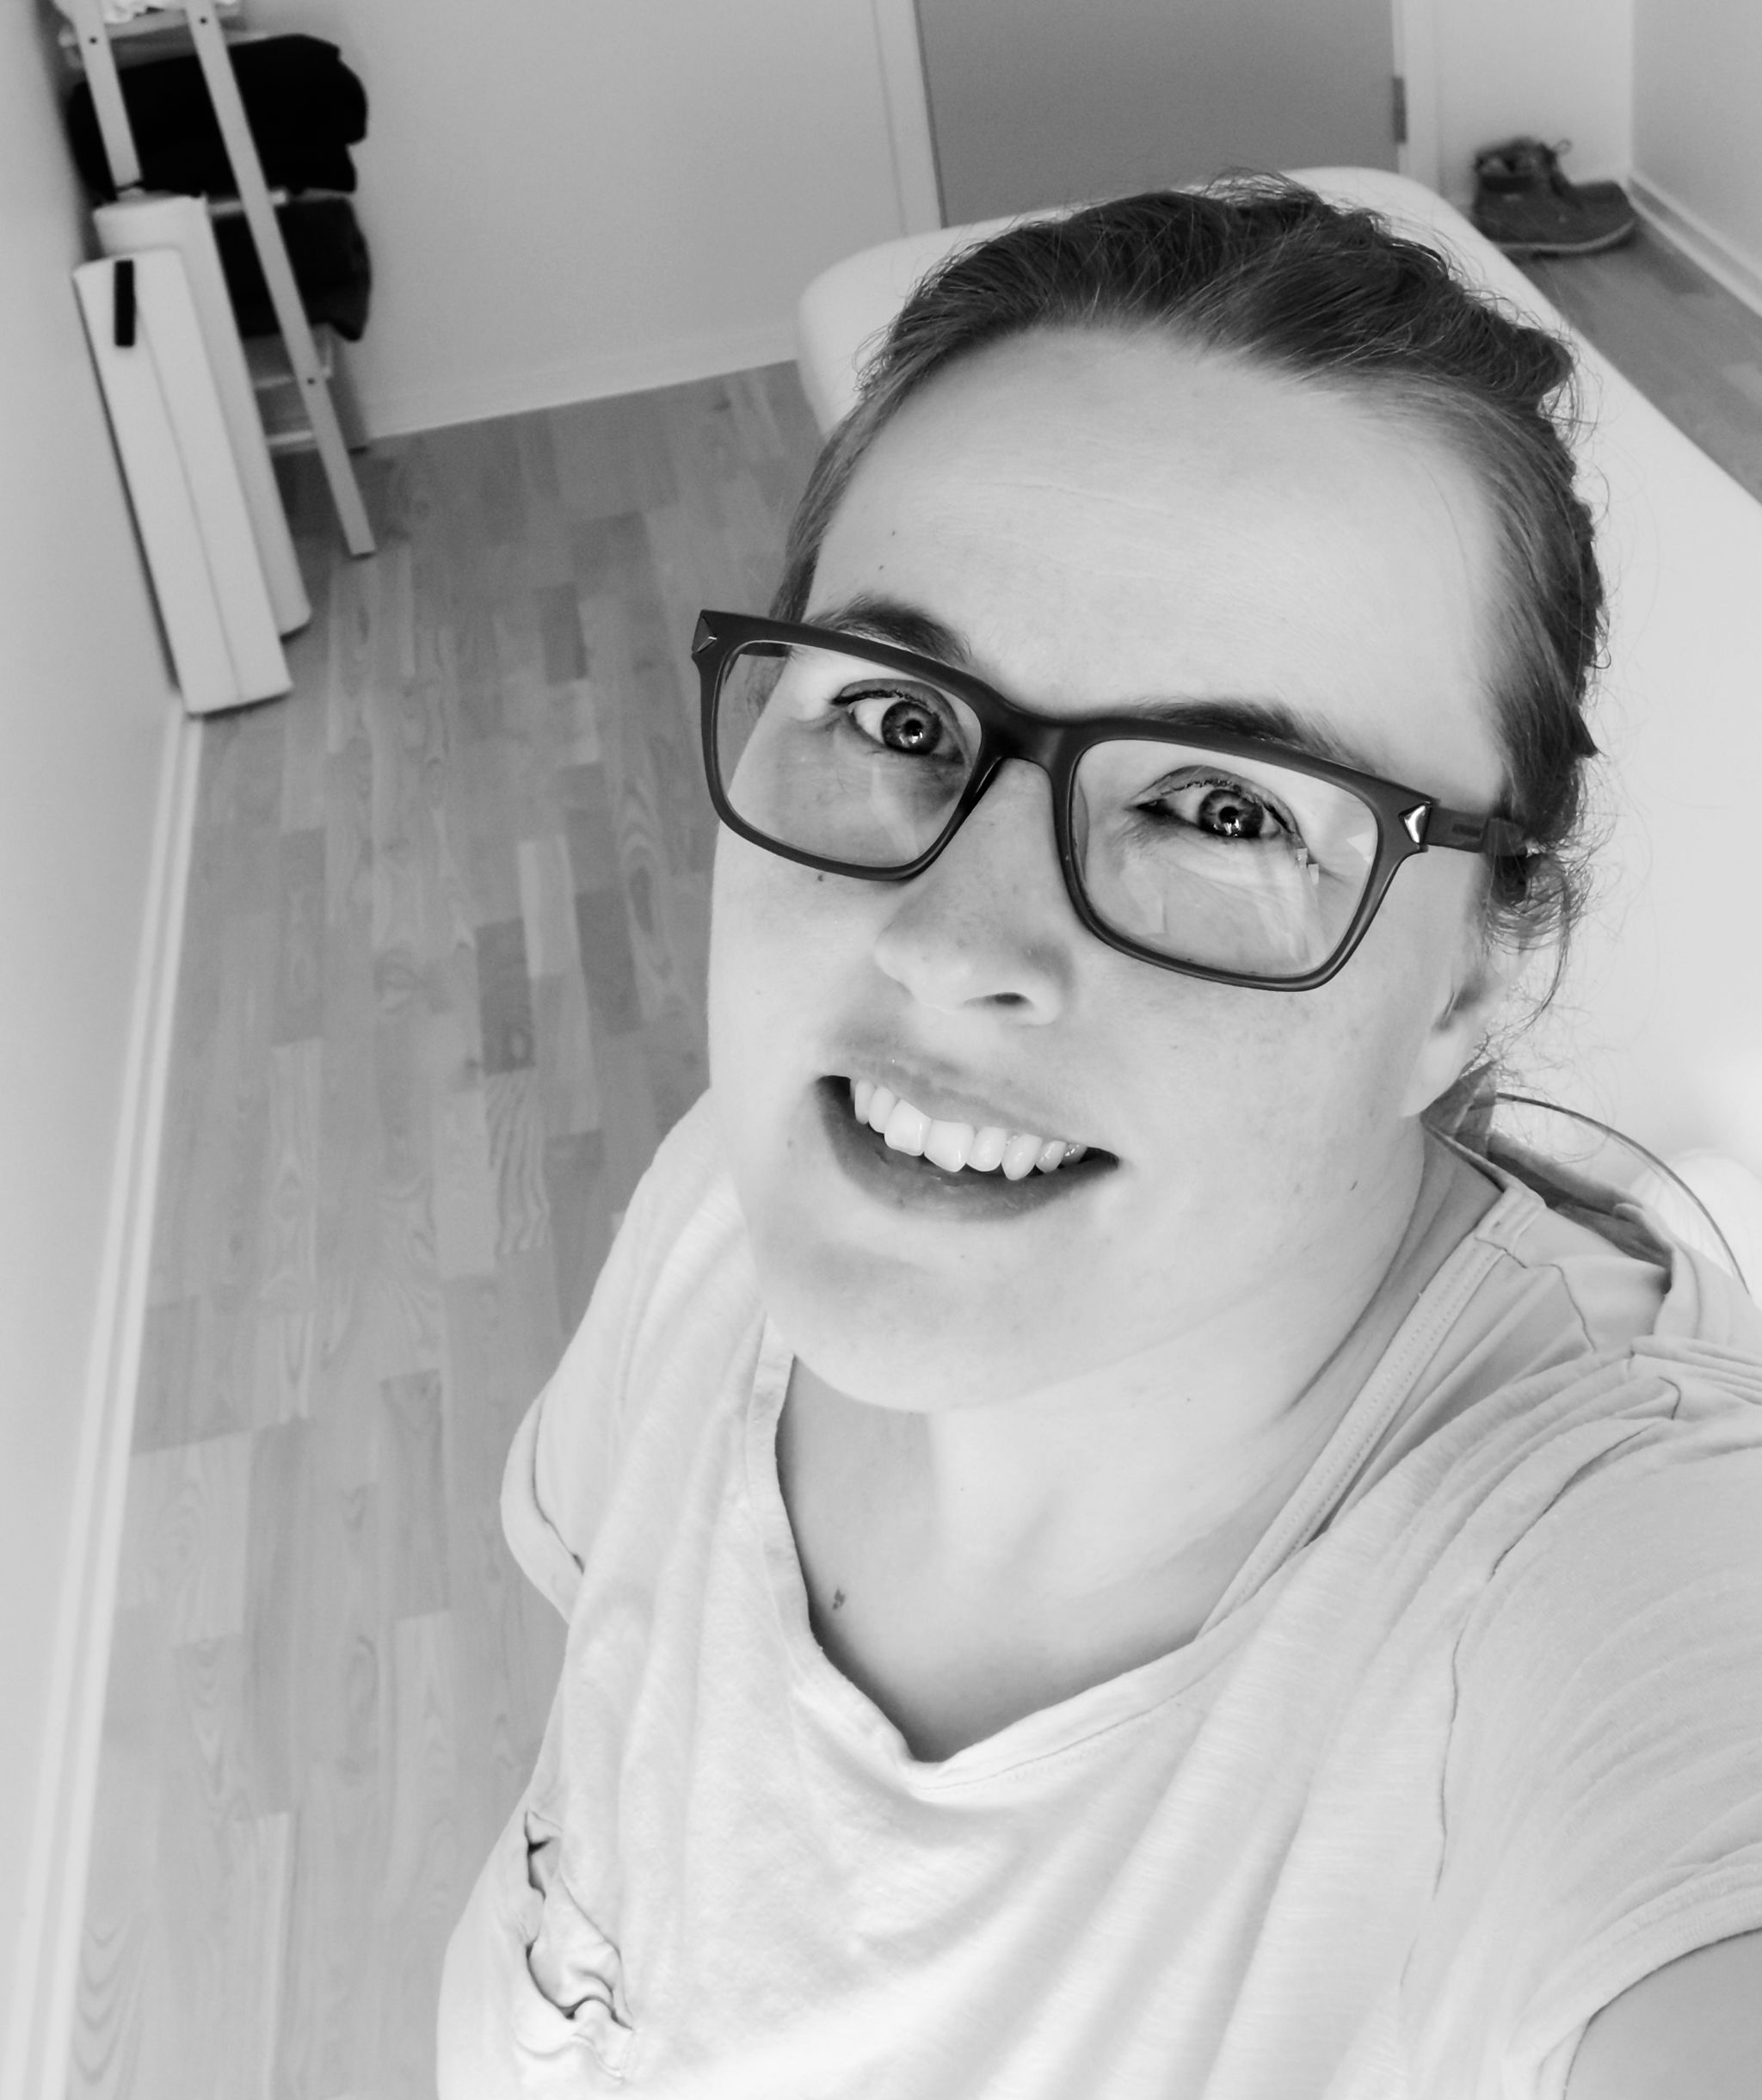 Kropsterapeut Tanja Bengaard - Kropsterapi i Slagelse